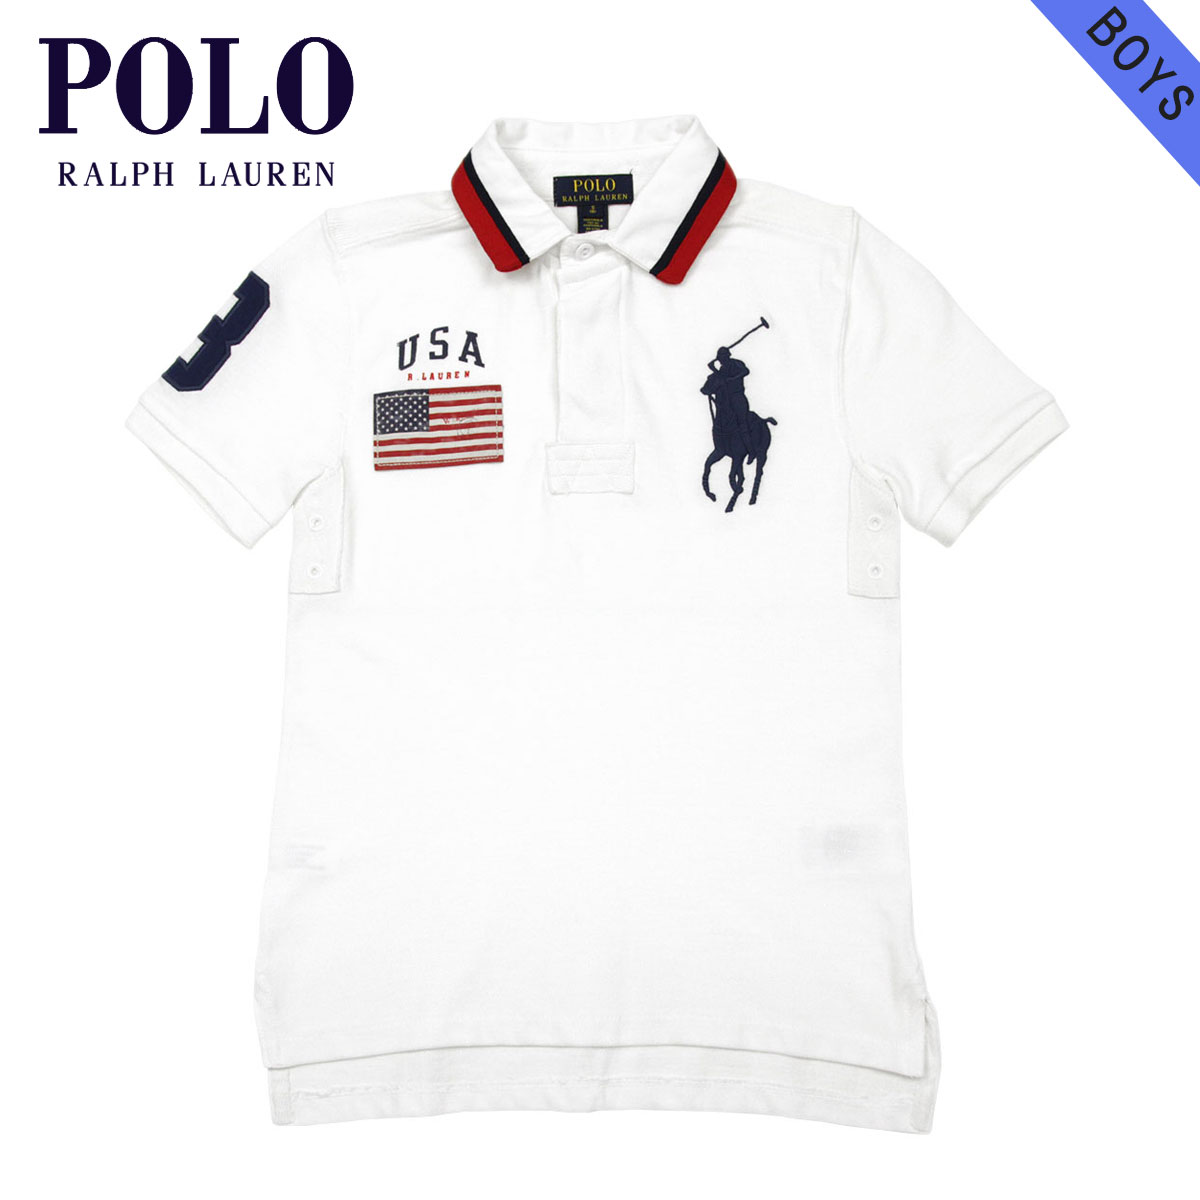 c06380b9dd65c Polo Ralph Lauren kids POLO RALPH LAUREN CHILDREN regular article children s  clothes boys polo shirt BIG PONY BORDER S S POLO 323591400001 D00S20